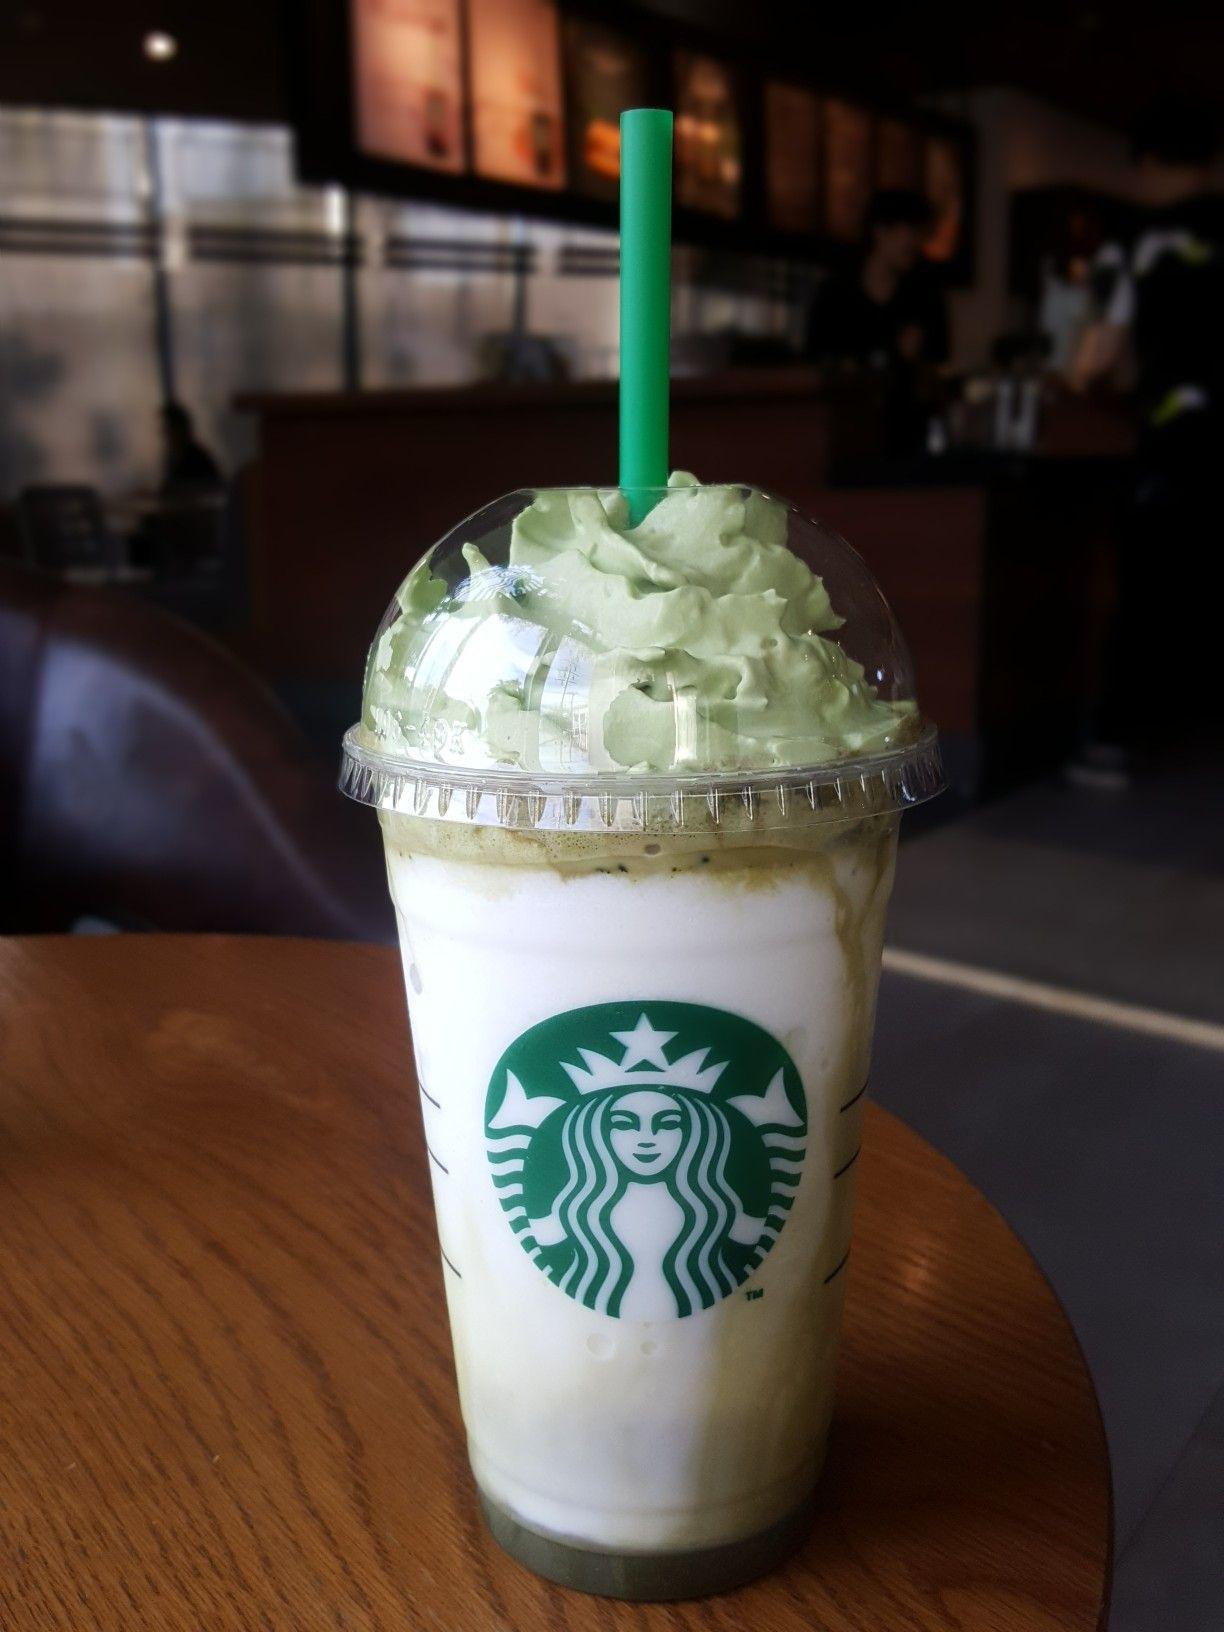 Pin by Olivia Jones on Starbucks Starbucks drinks